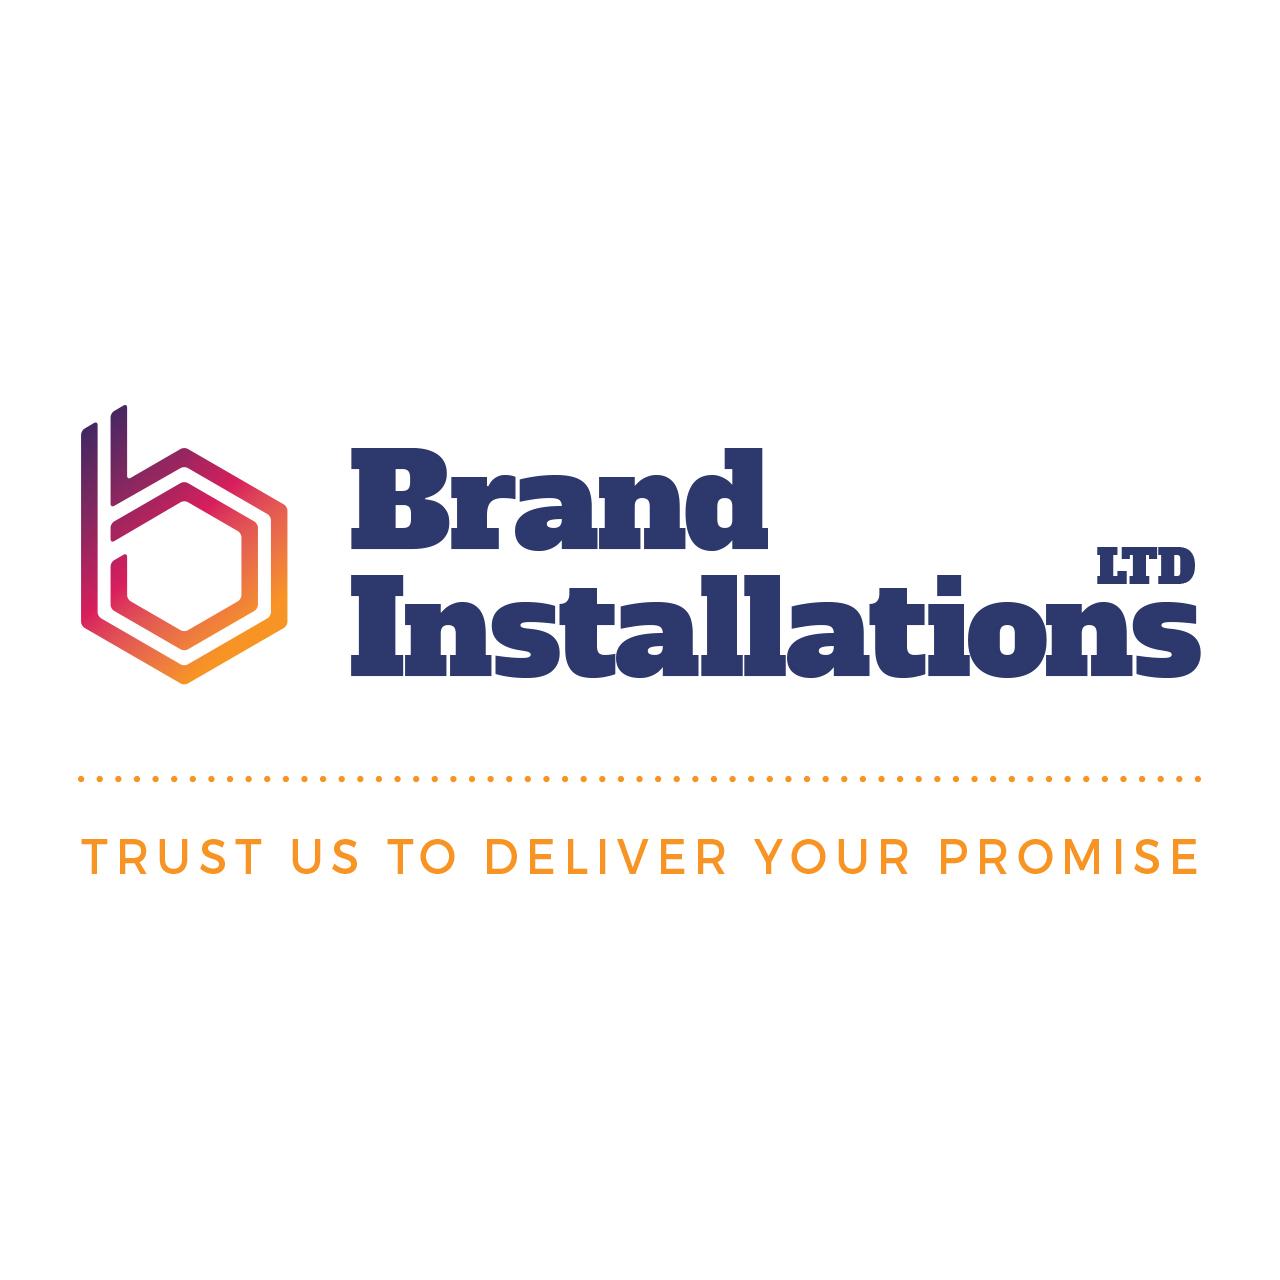 Brand-Installations-Logo